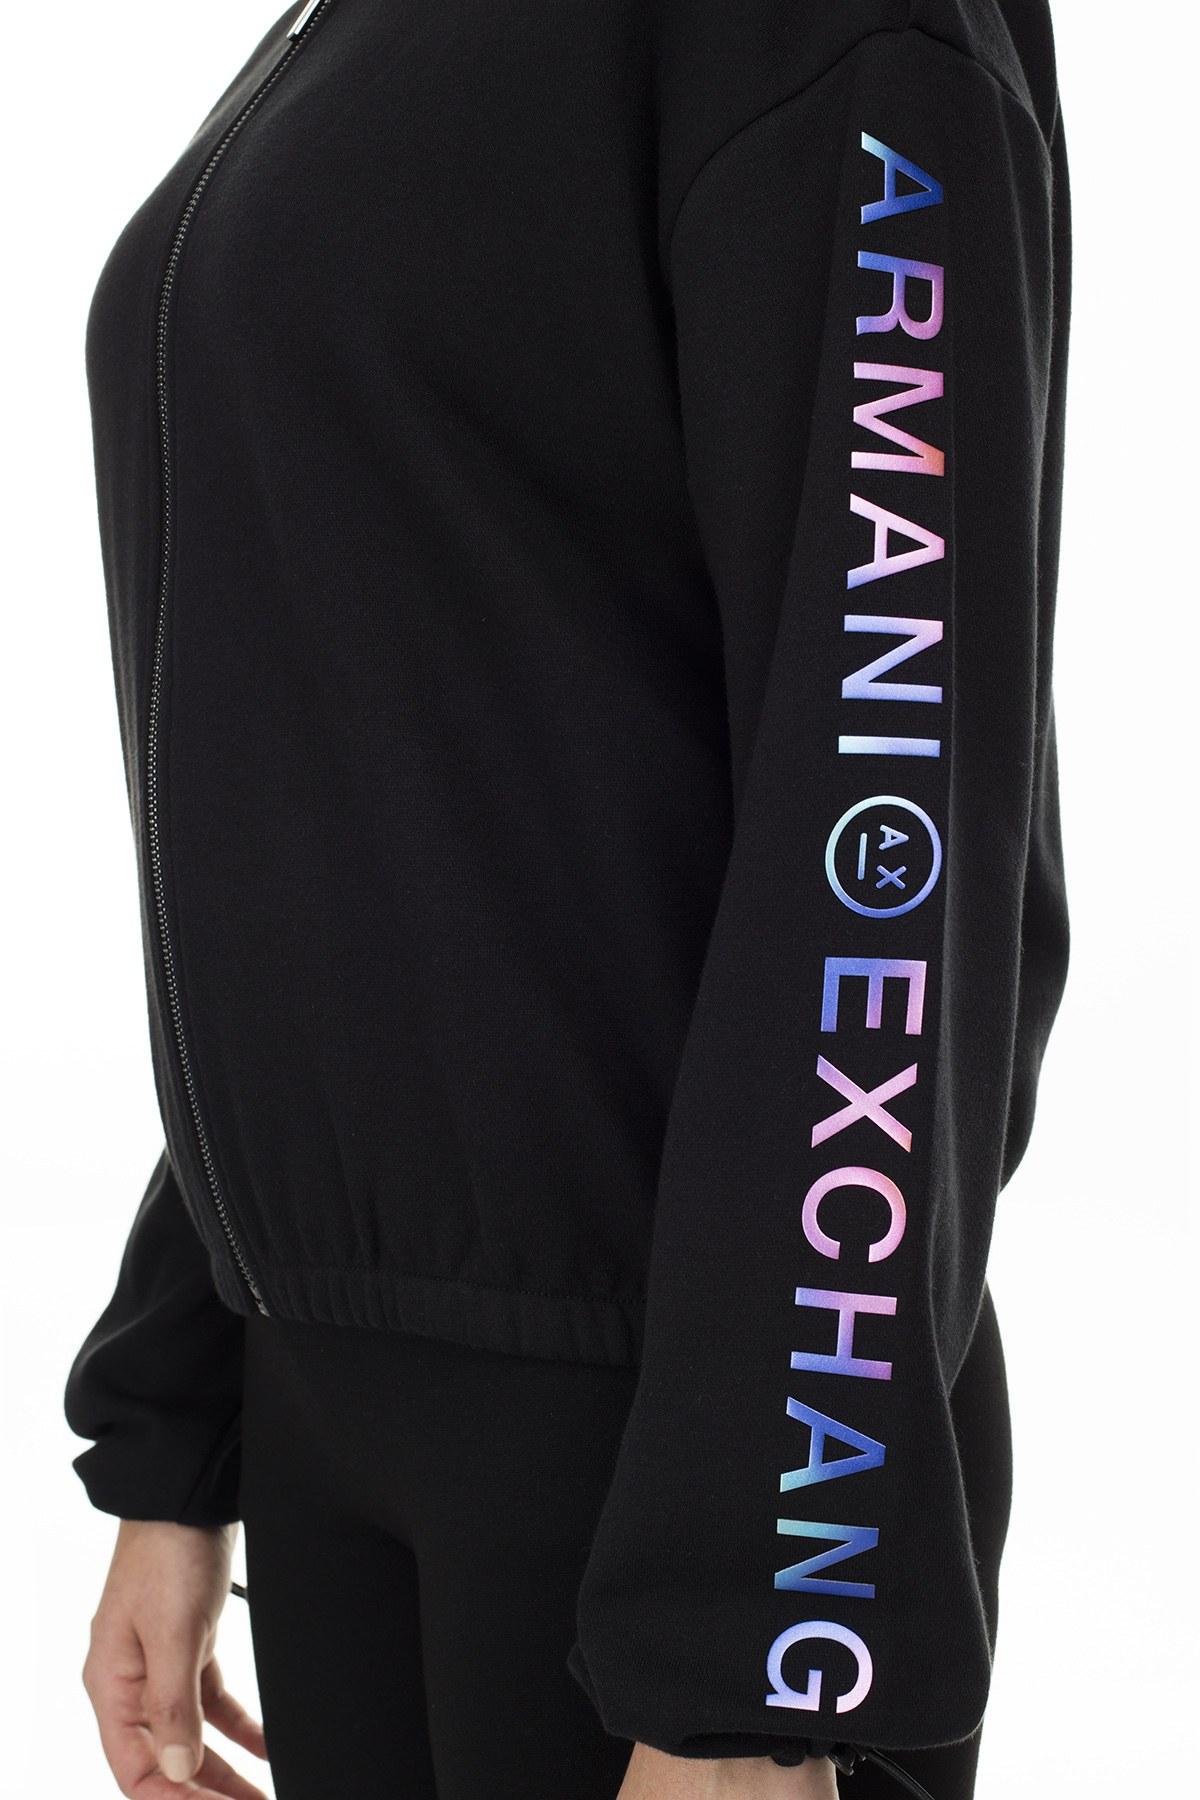 Armani Exchange Logo Baskılı Fermuar Kapama Bayan Sweat 6GYM77 YJ44Z 1200 SİYAH